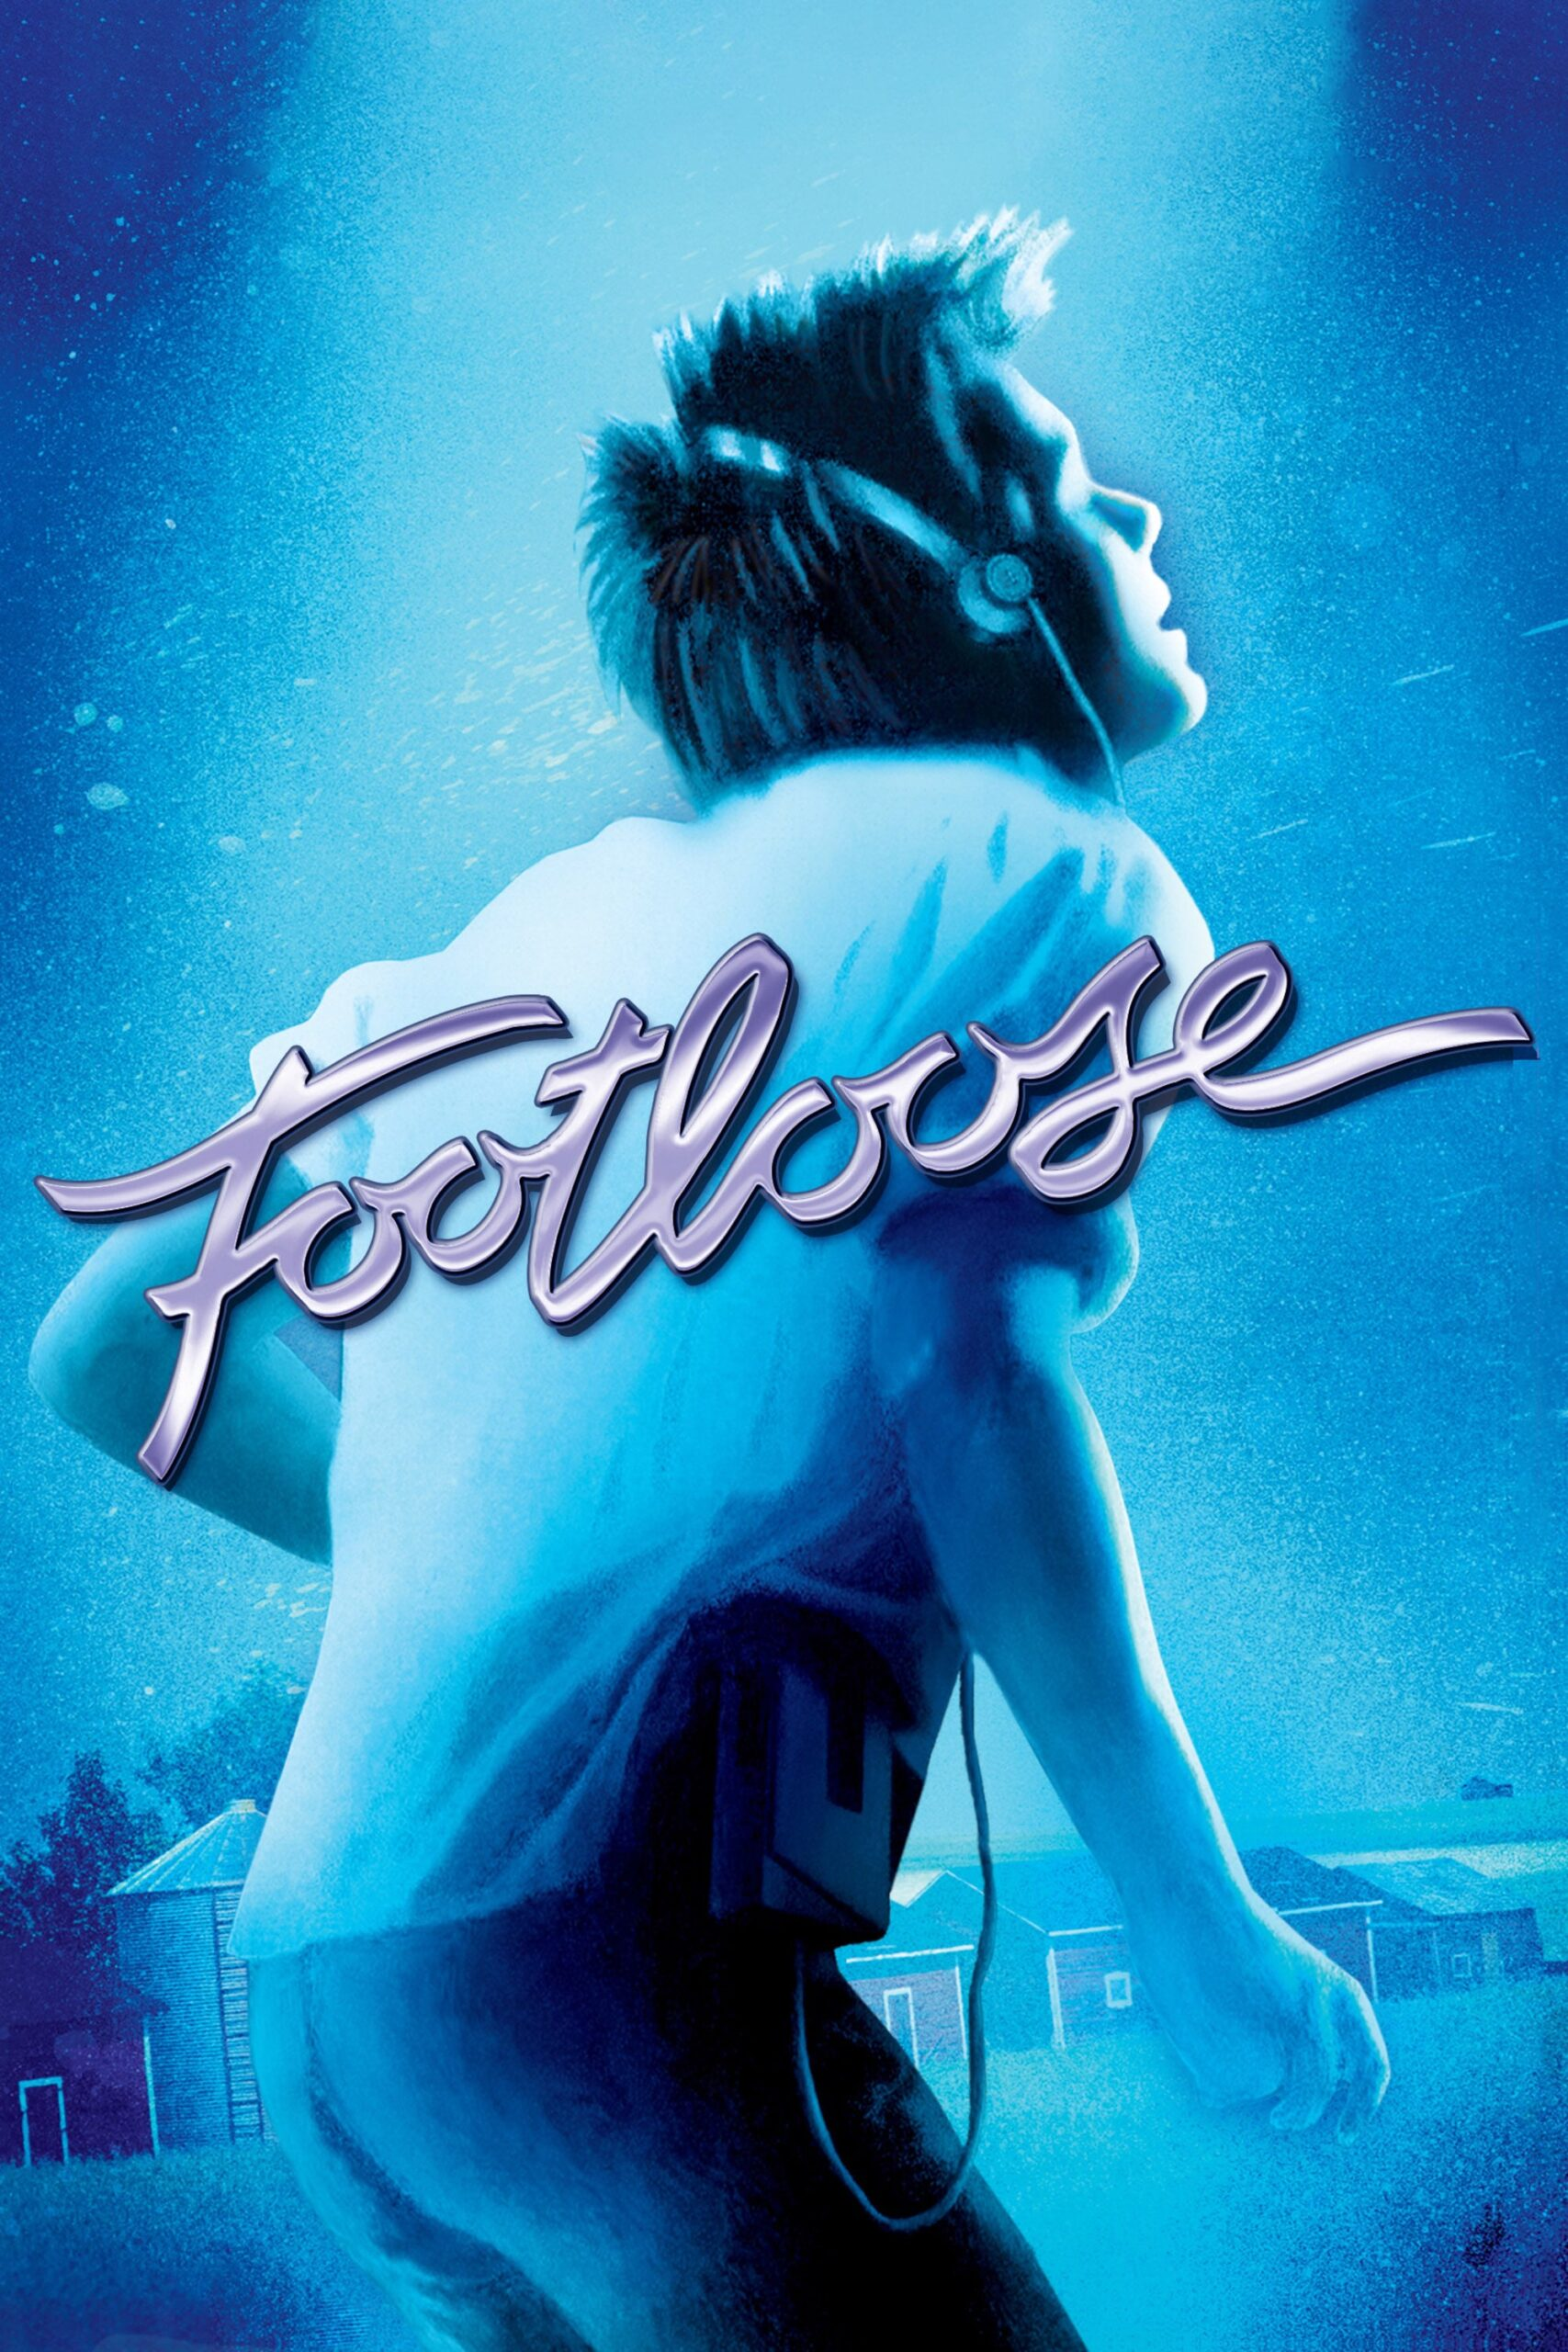 Footloose Movie Streaming Online Watch on iTunes